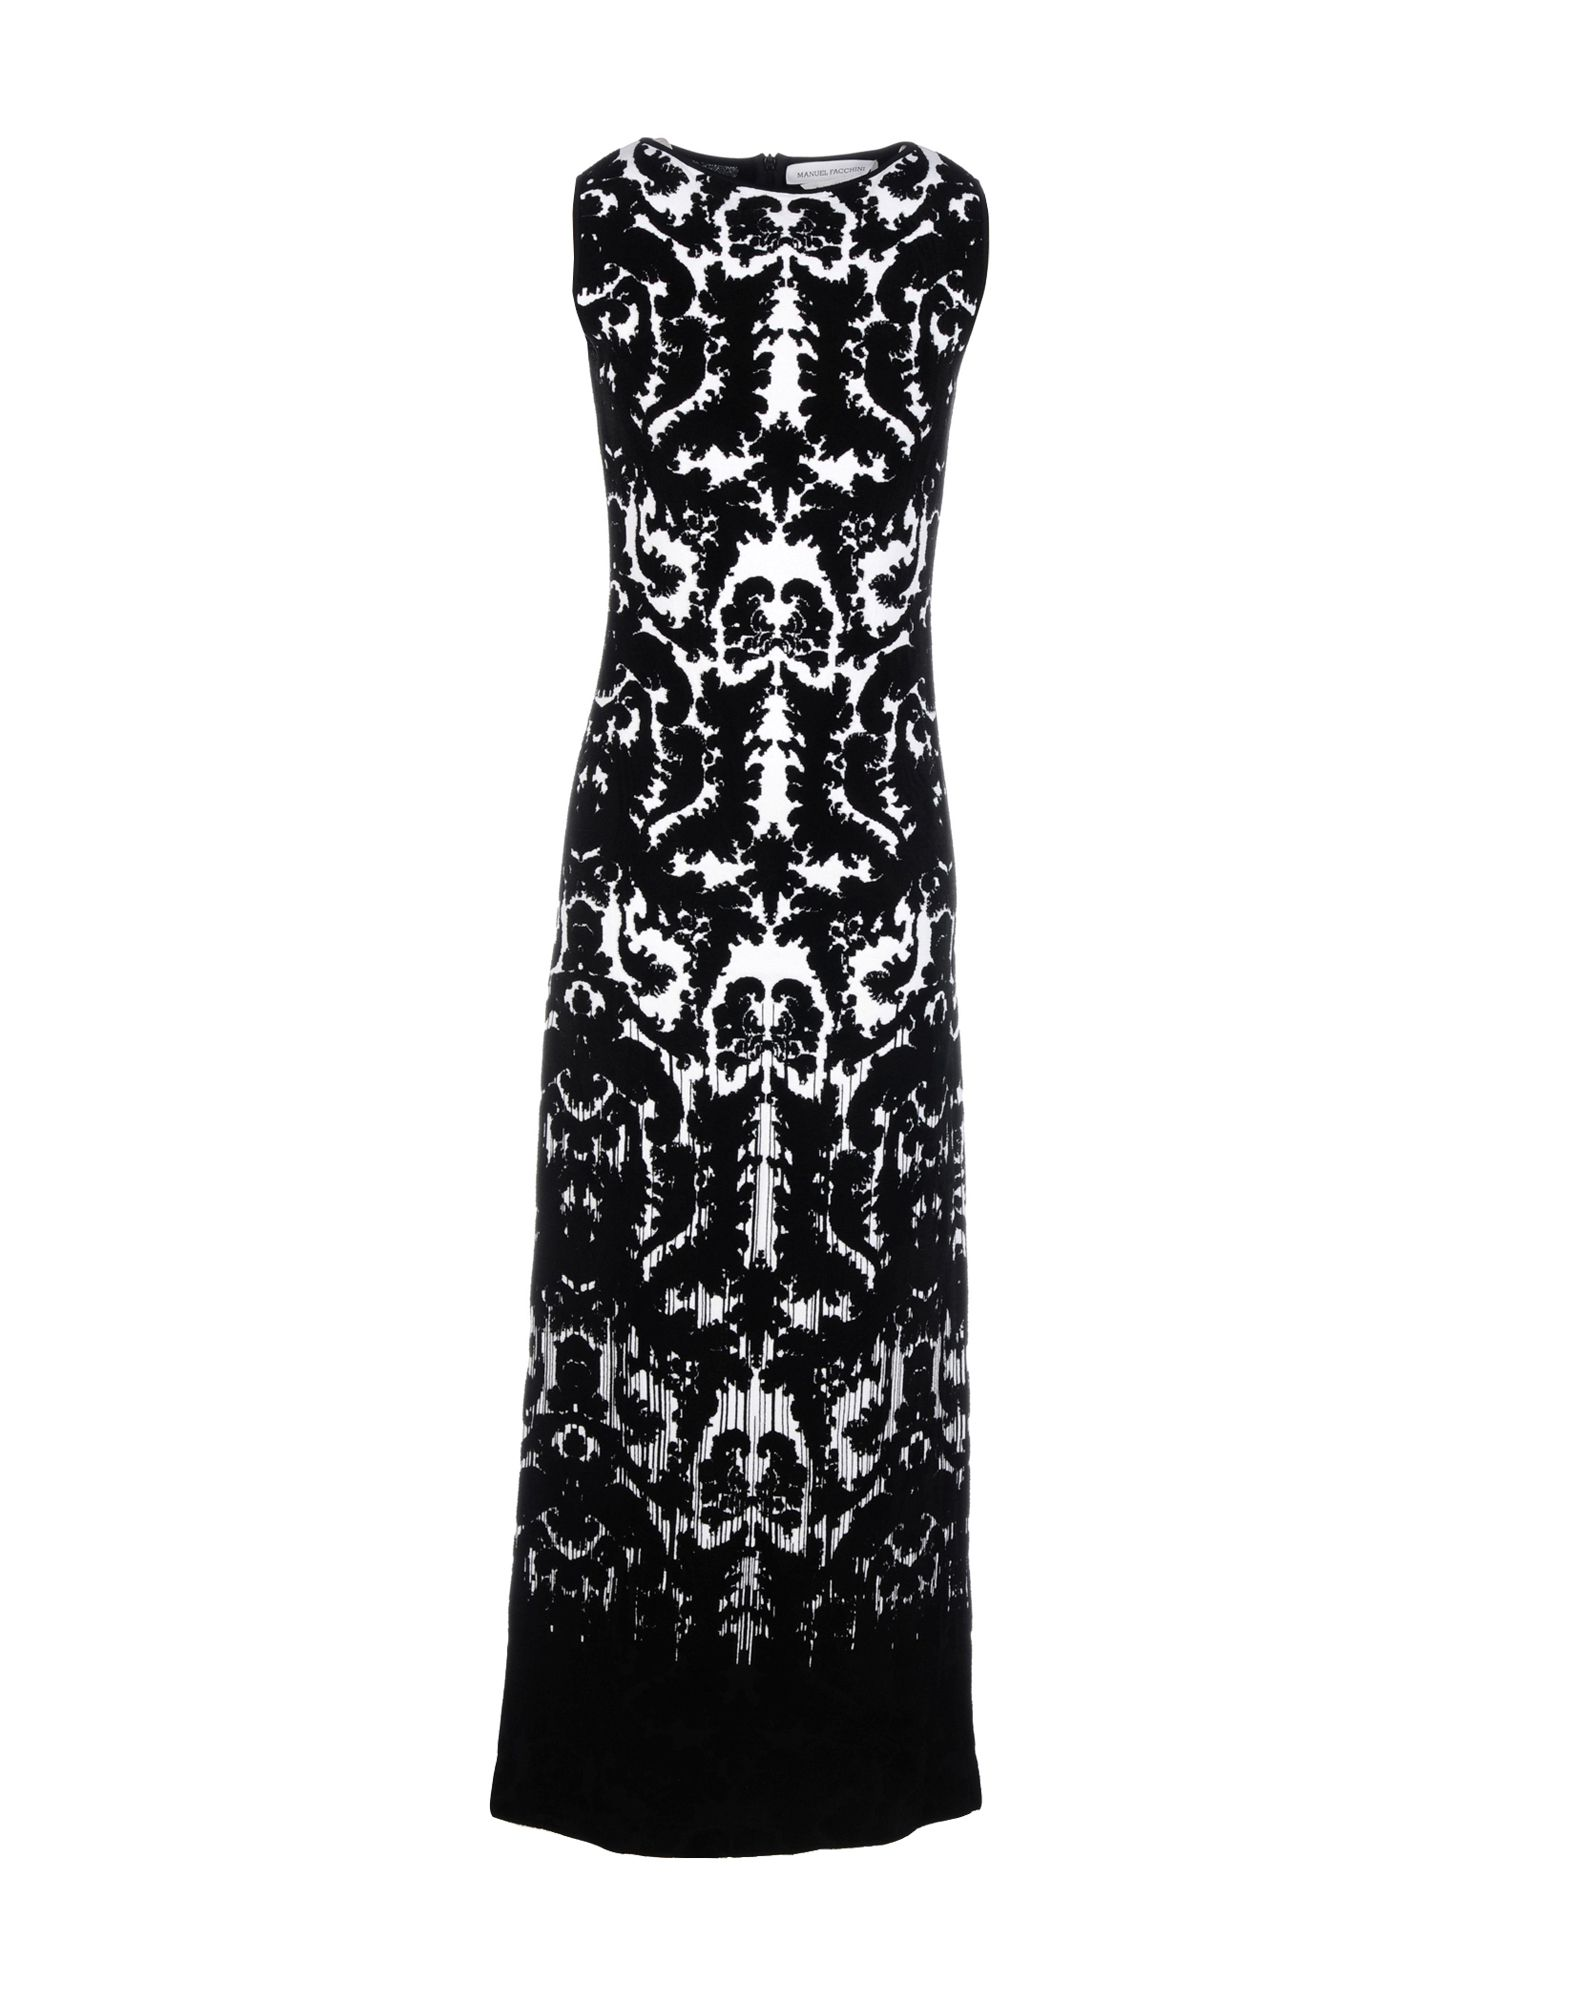 MANUEL FACCHINI Long Dresses in Black